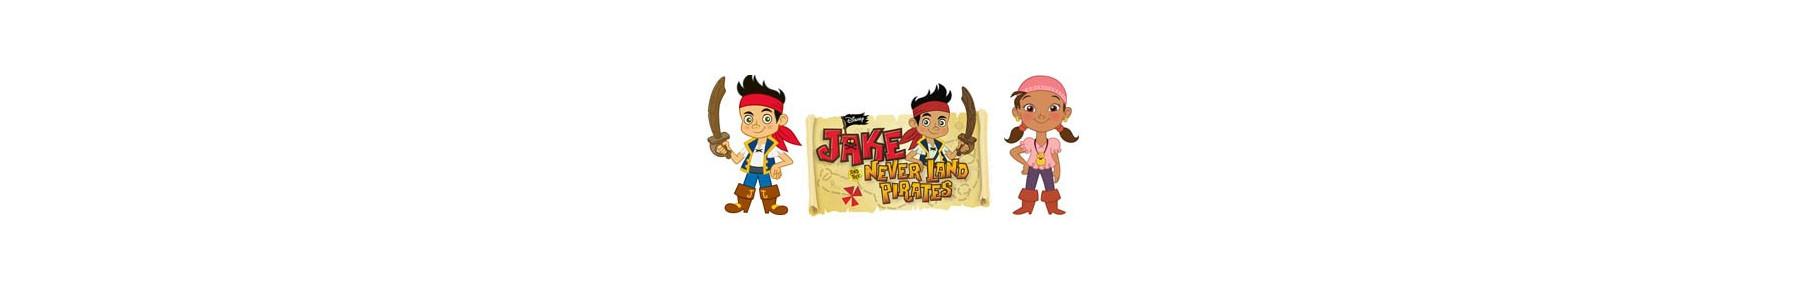 Colectia party Piratii Jake & Neverland